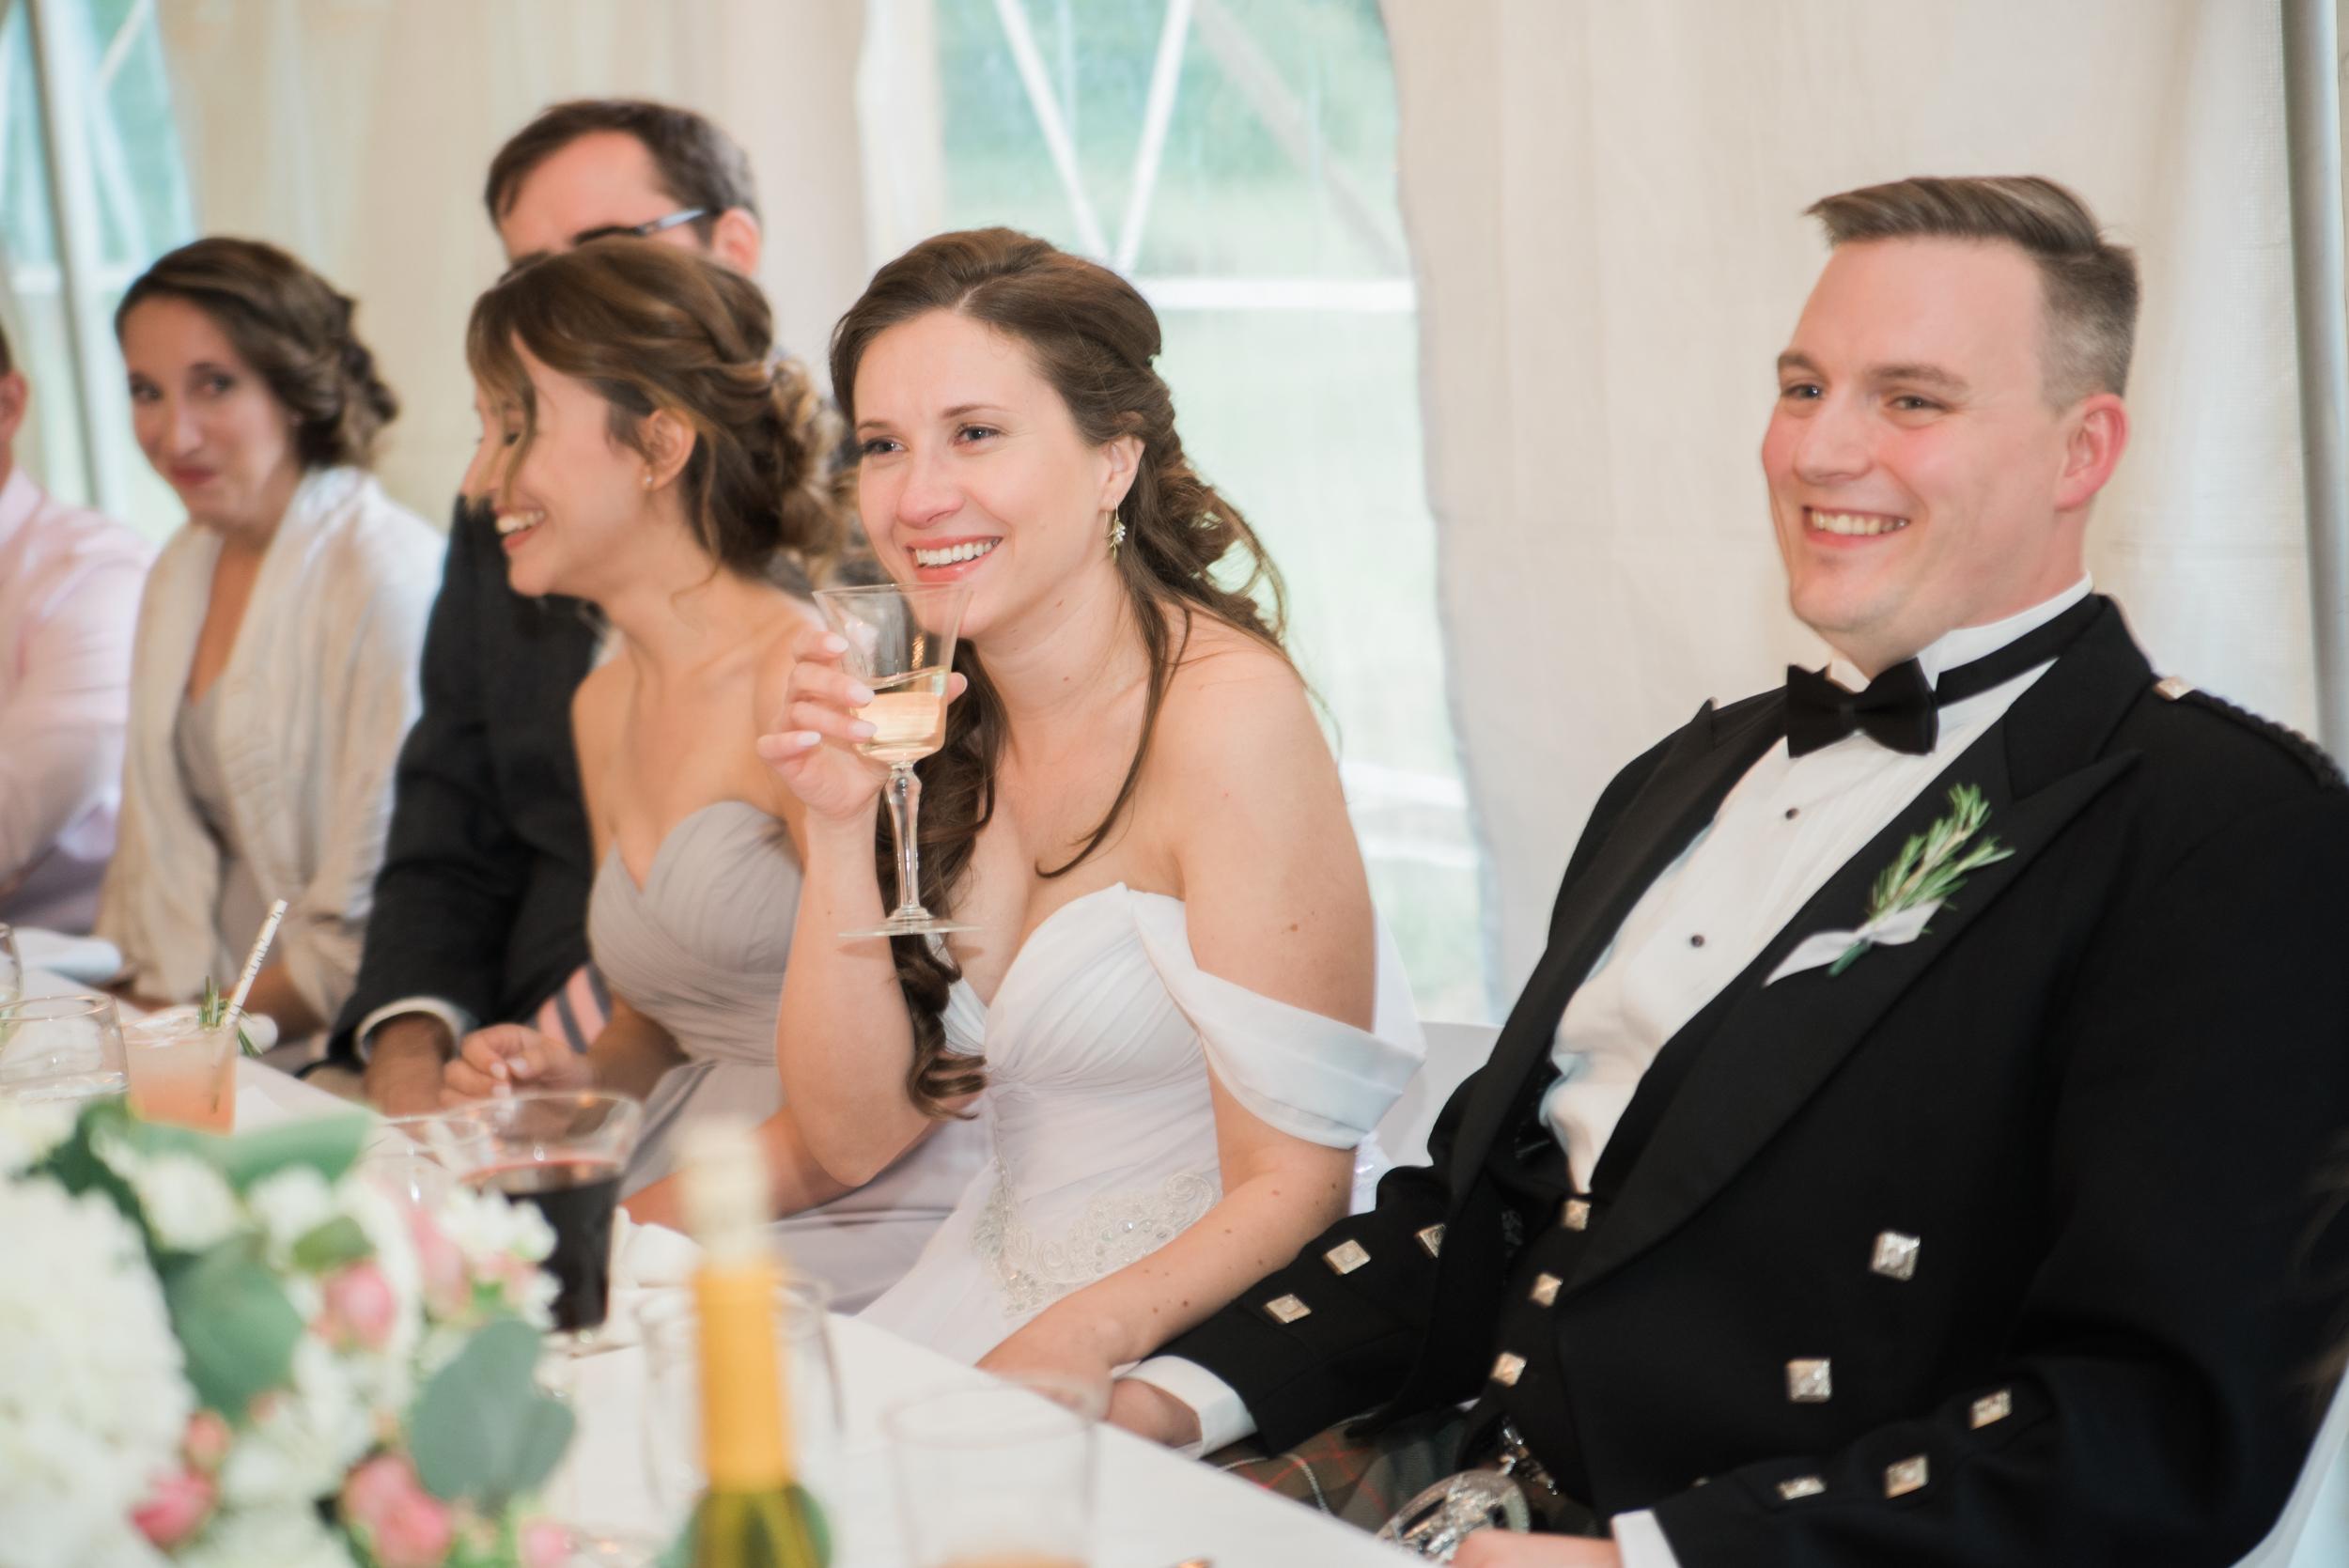 Backyard wedding in Amherst MA